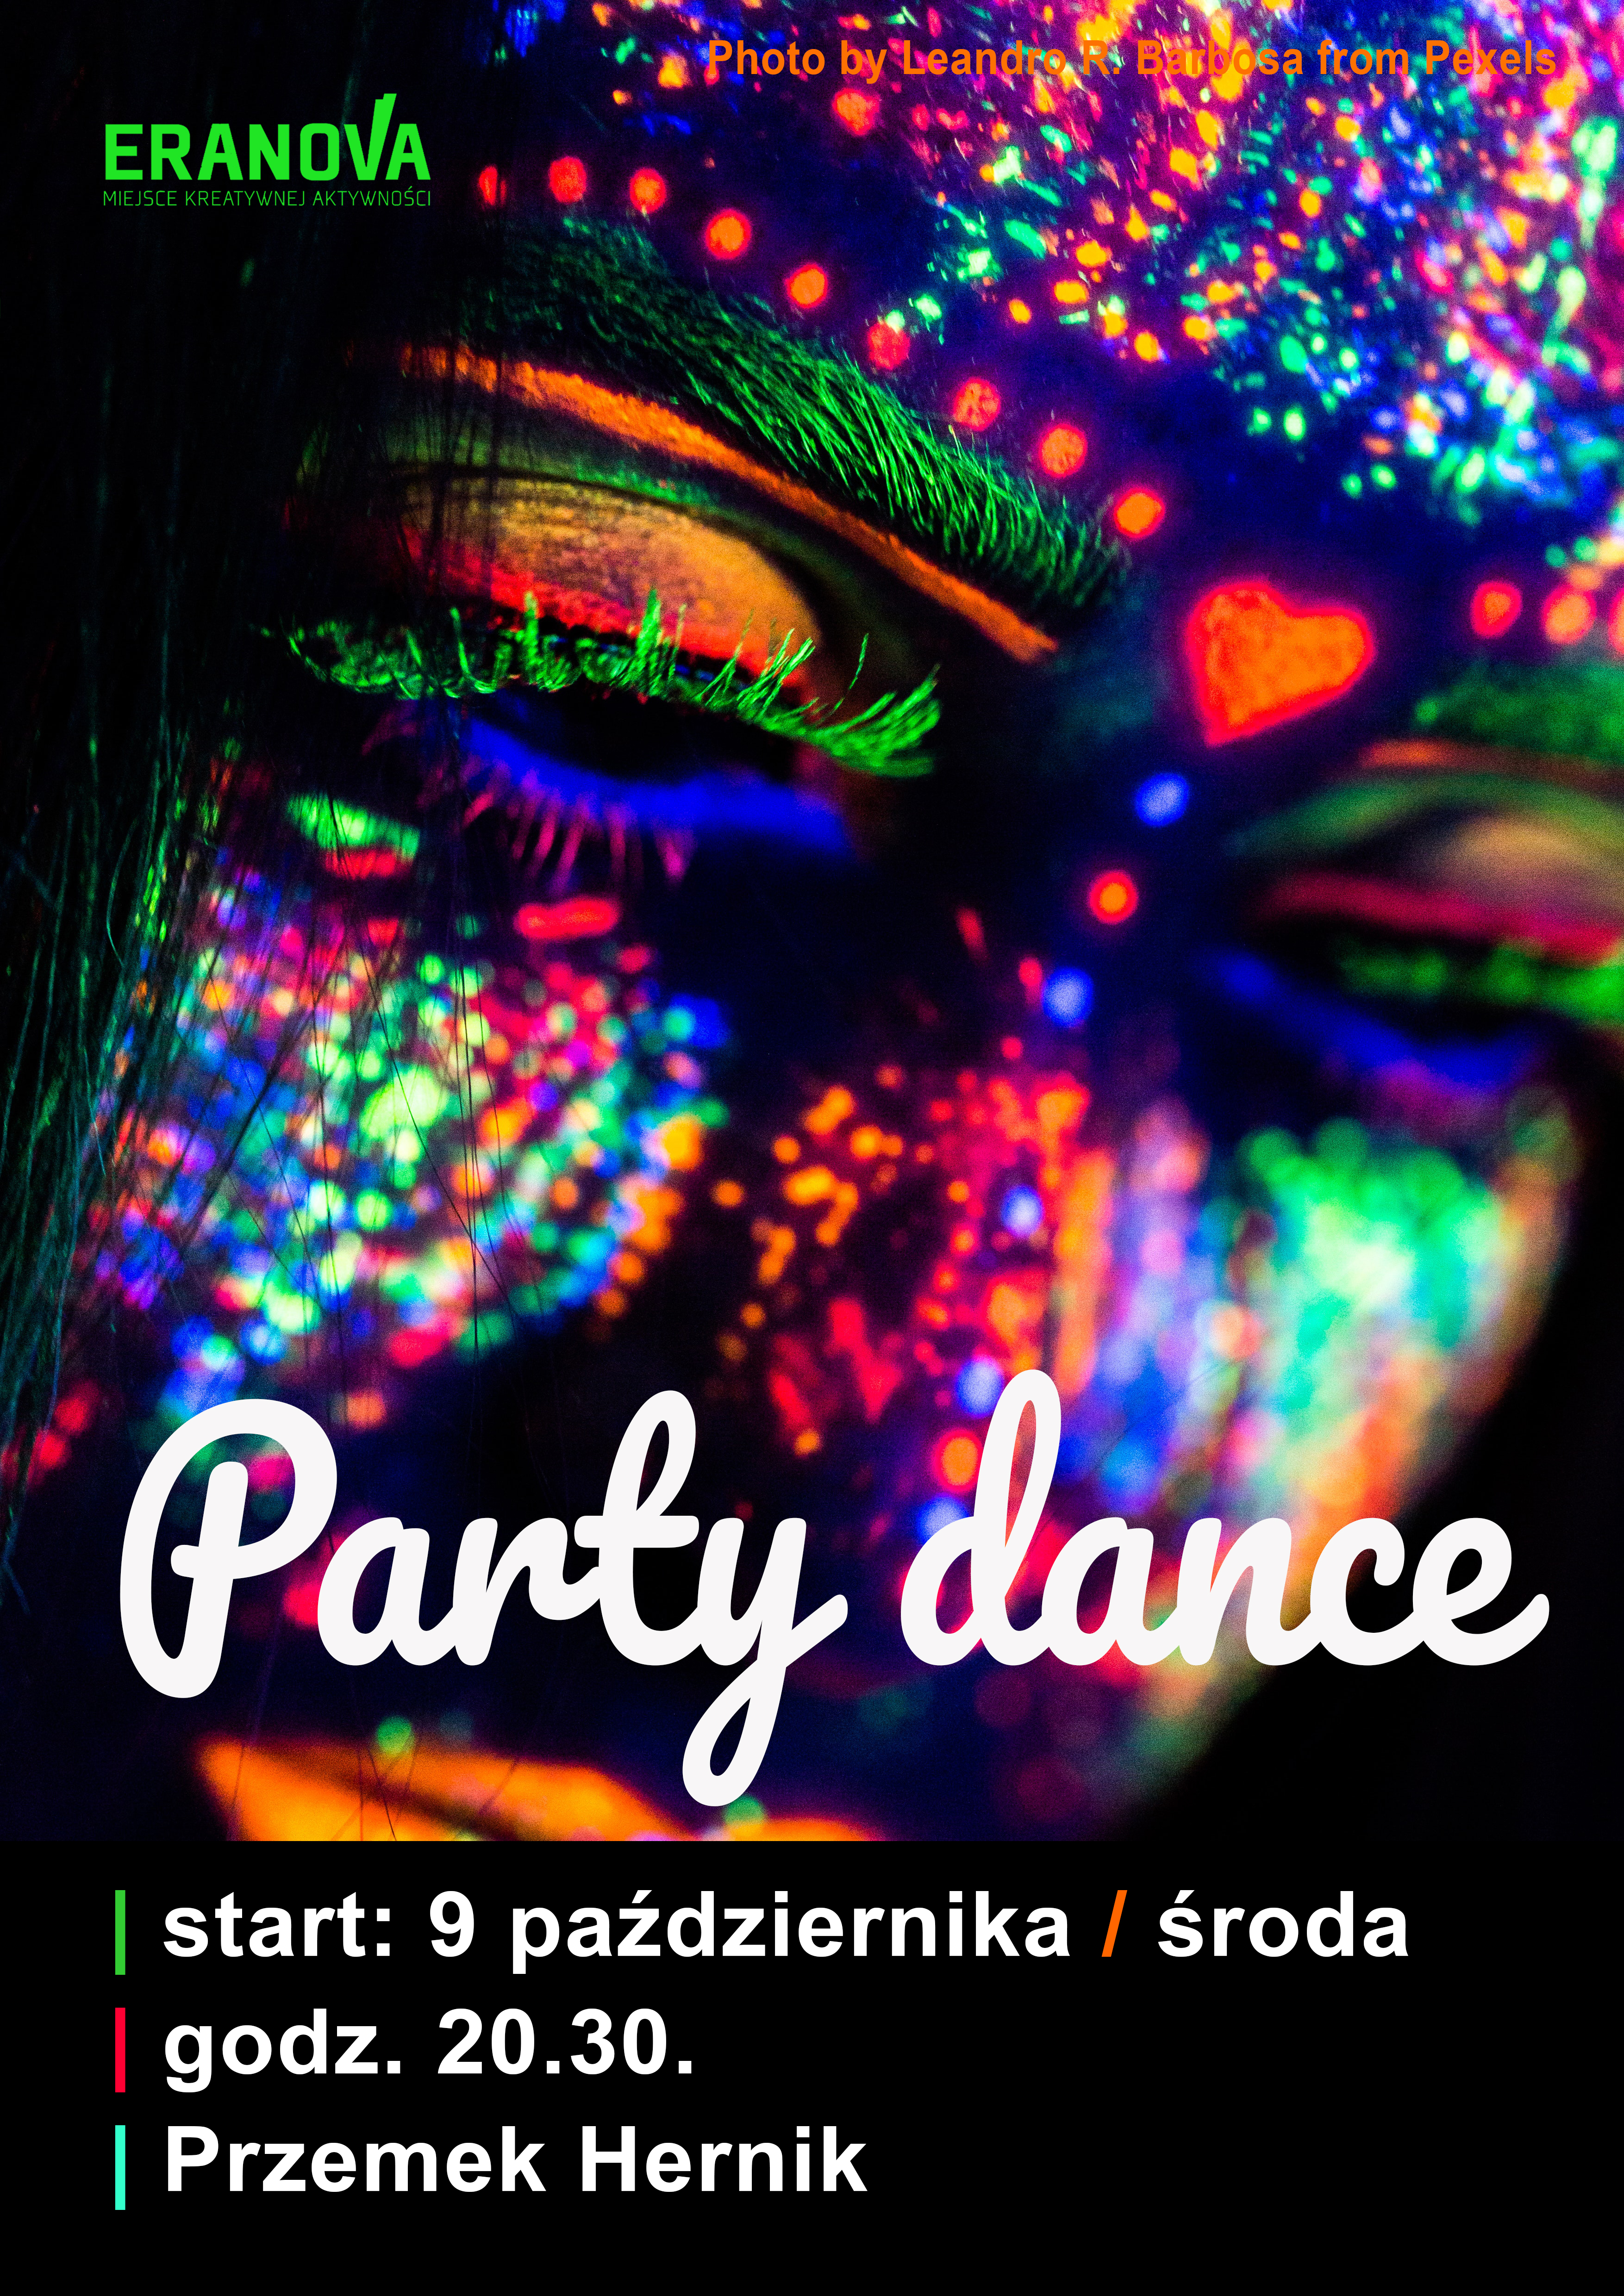 http://m.eranova.pl/2019/09/orig/party-dance-naj-3079.jpg